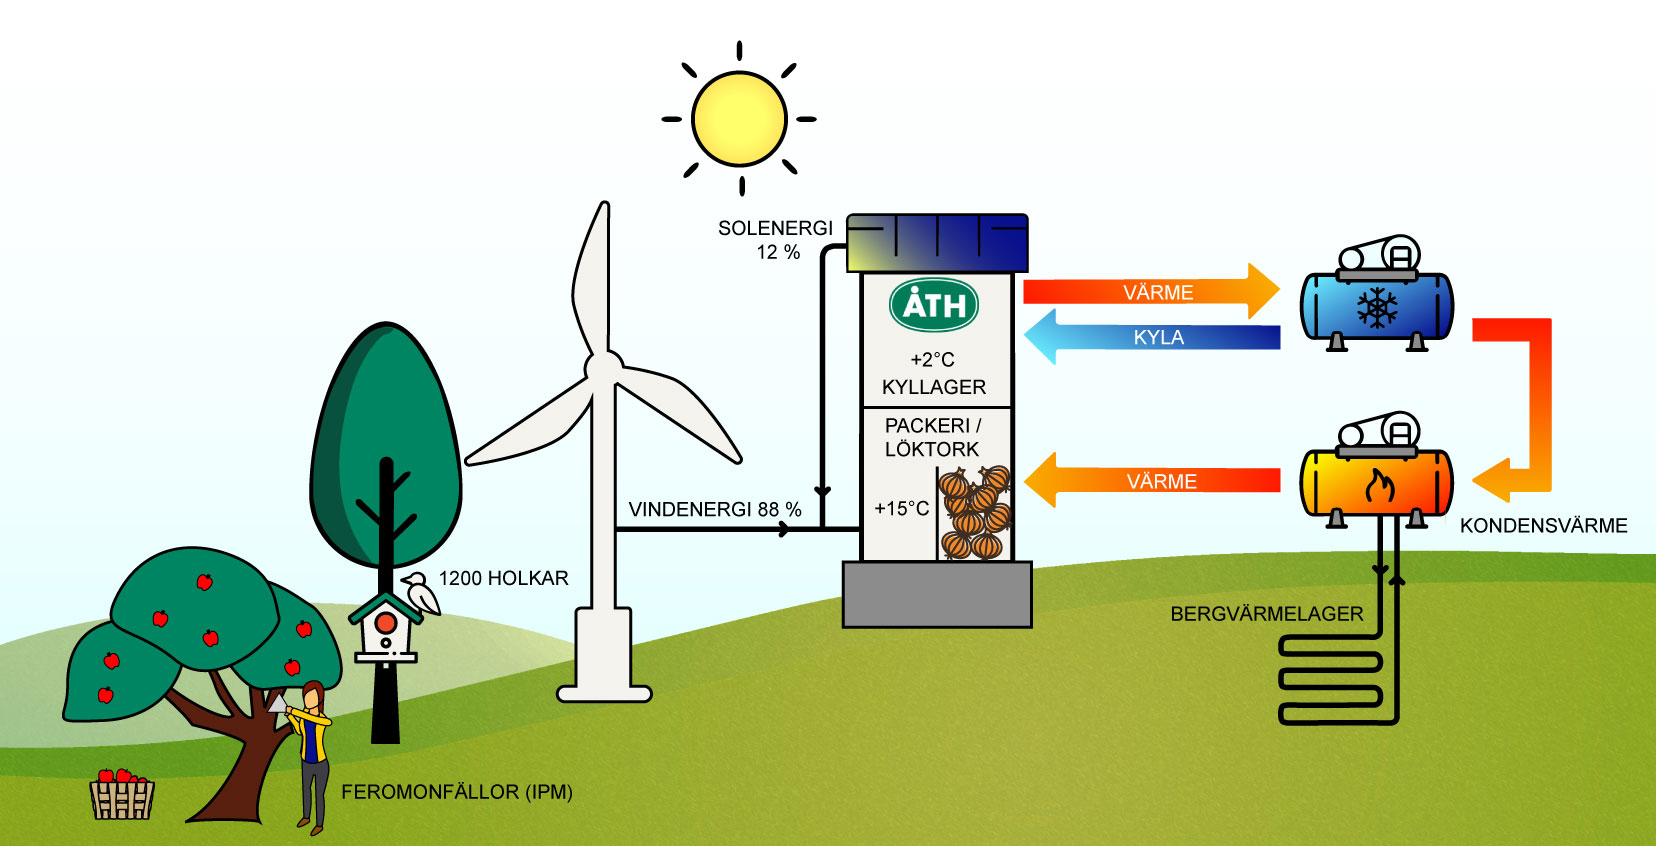 ÅTH-Energisystem